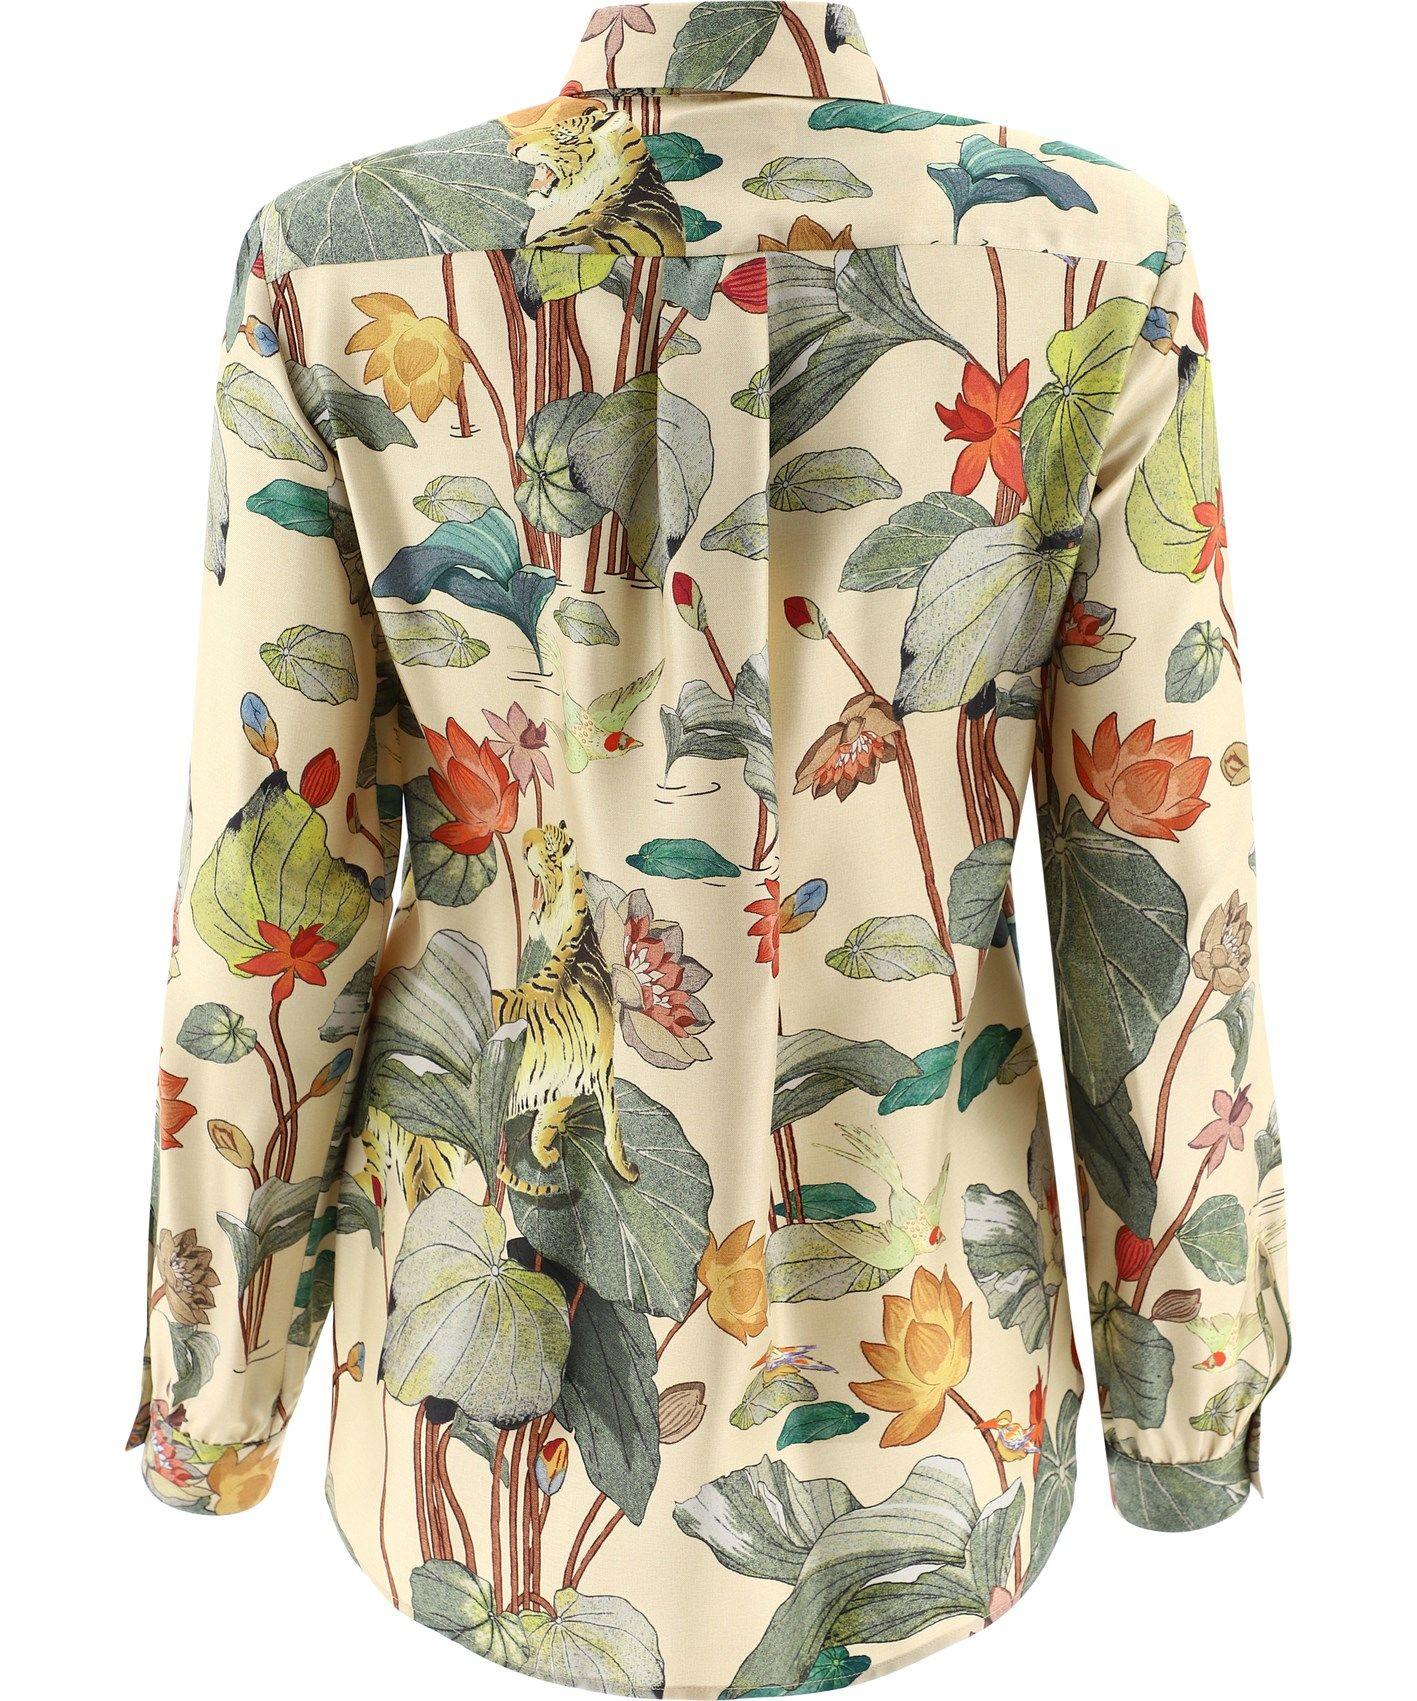 ETRO Shirts ETRO WOMEN'S YELLOW OTHER MATERIALS SHIRT